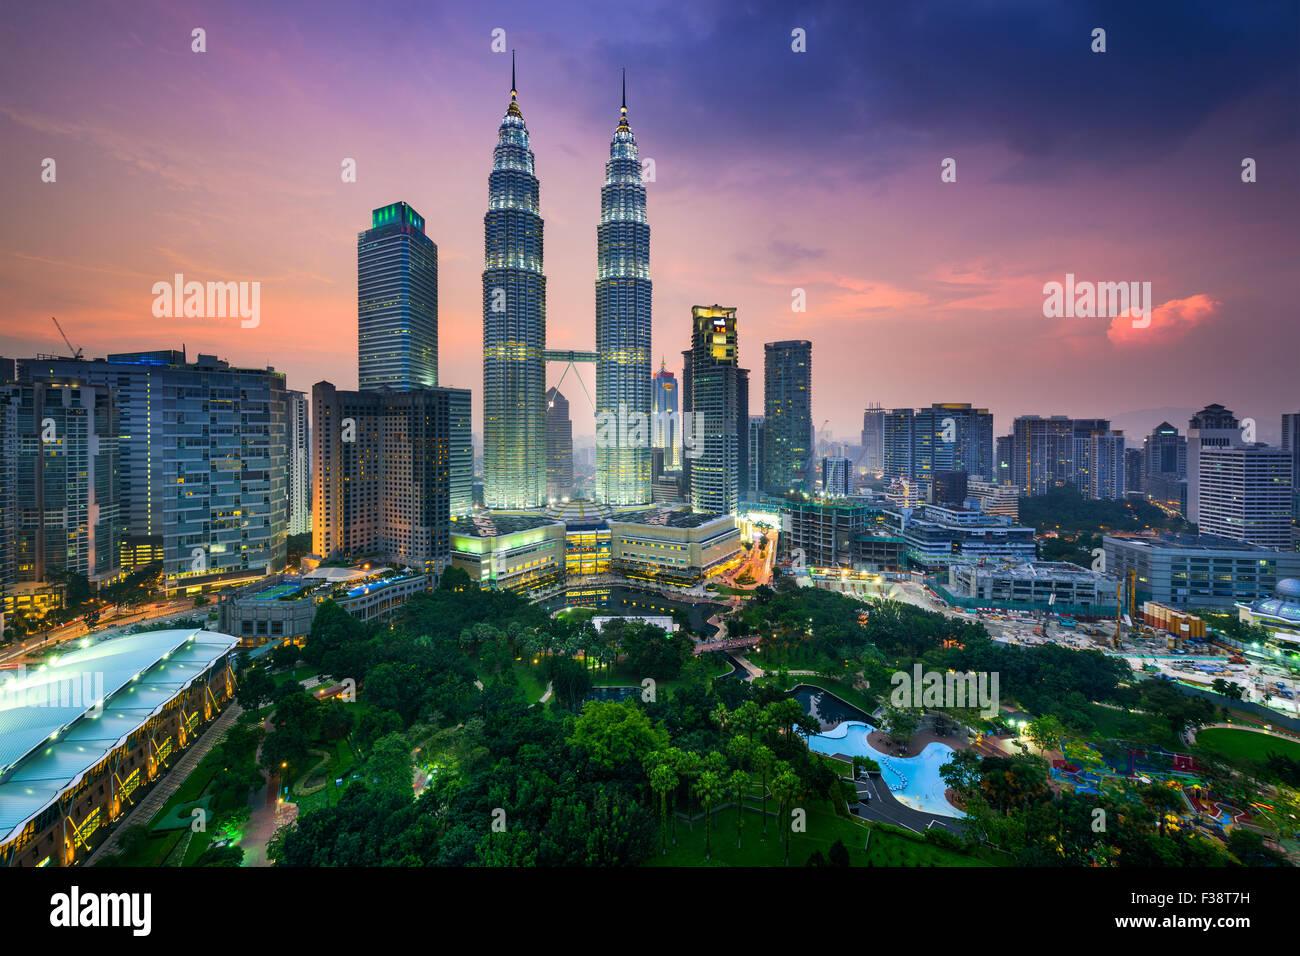 Kuala Lumpur, Malaysia city skyline. - Stock Image